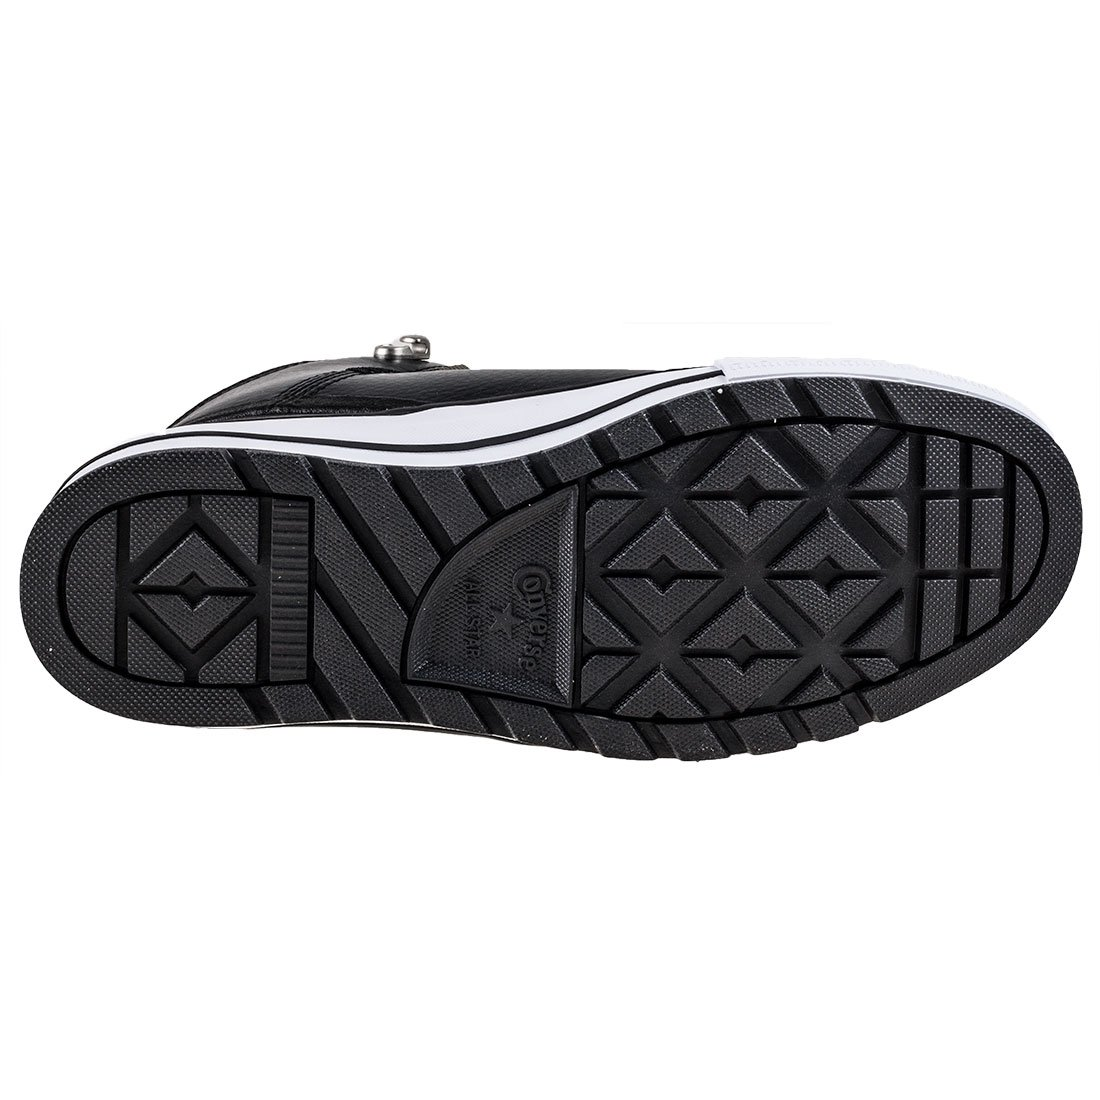 Converse Herren Sneaker Schwarz 157506C Schwarz Sneaker 363021 Schwarz 635ba9